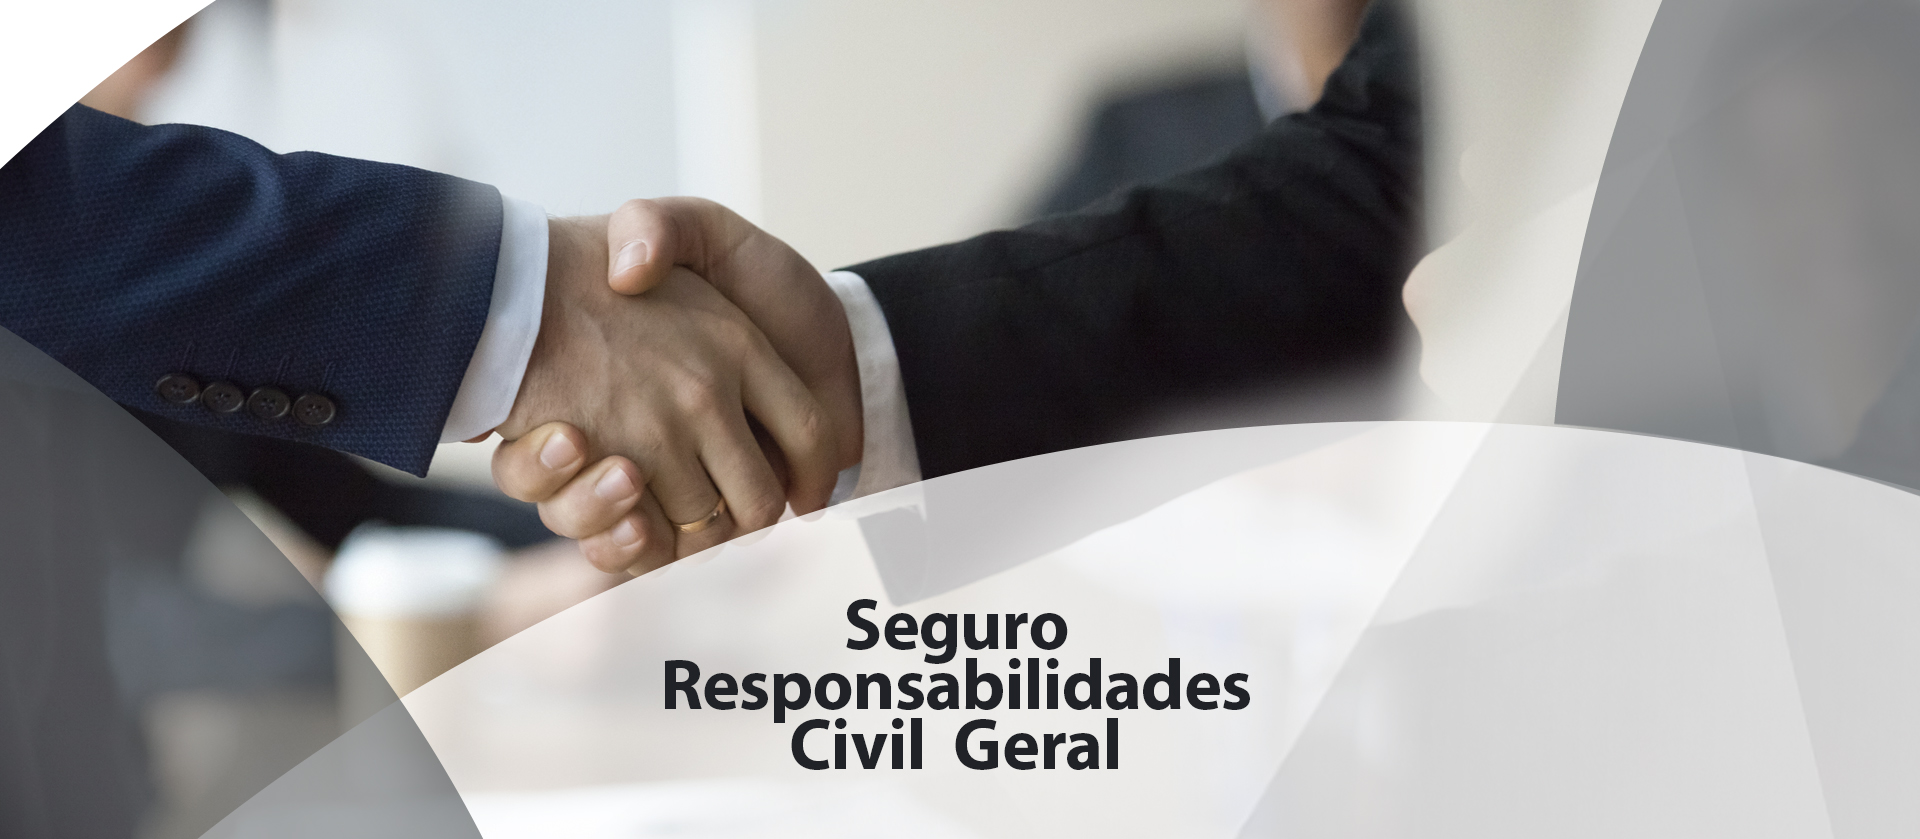 Page Responsabilidade Civil